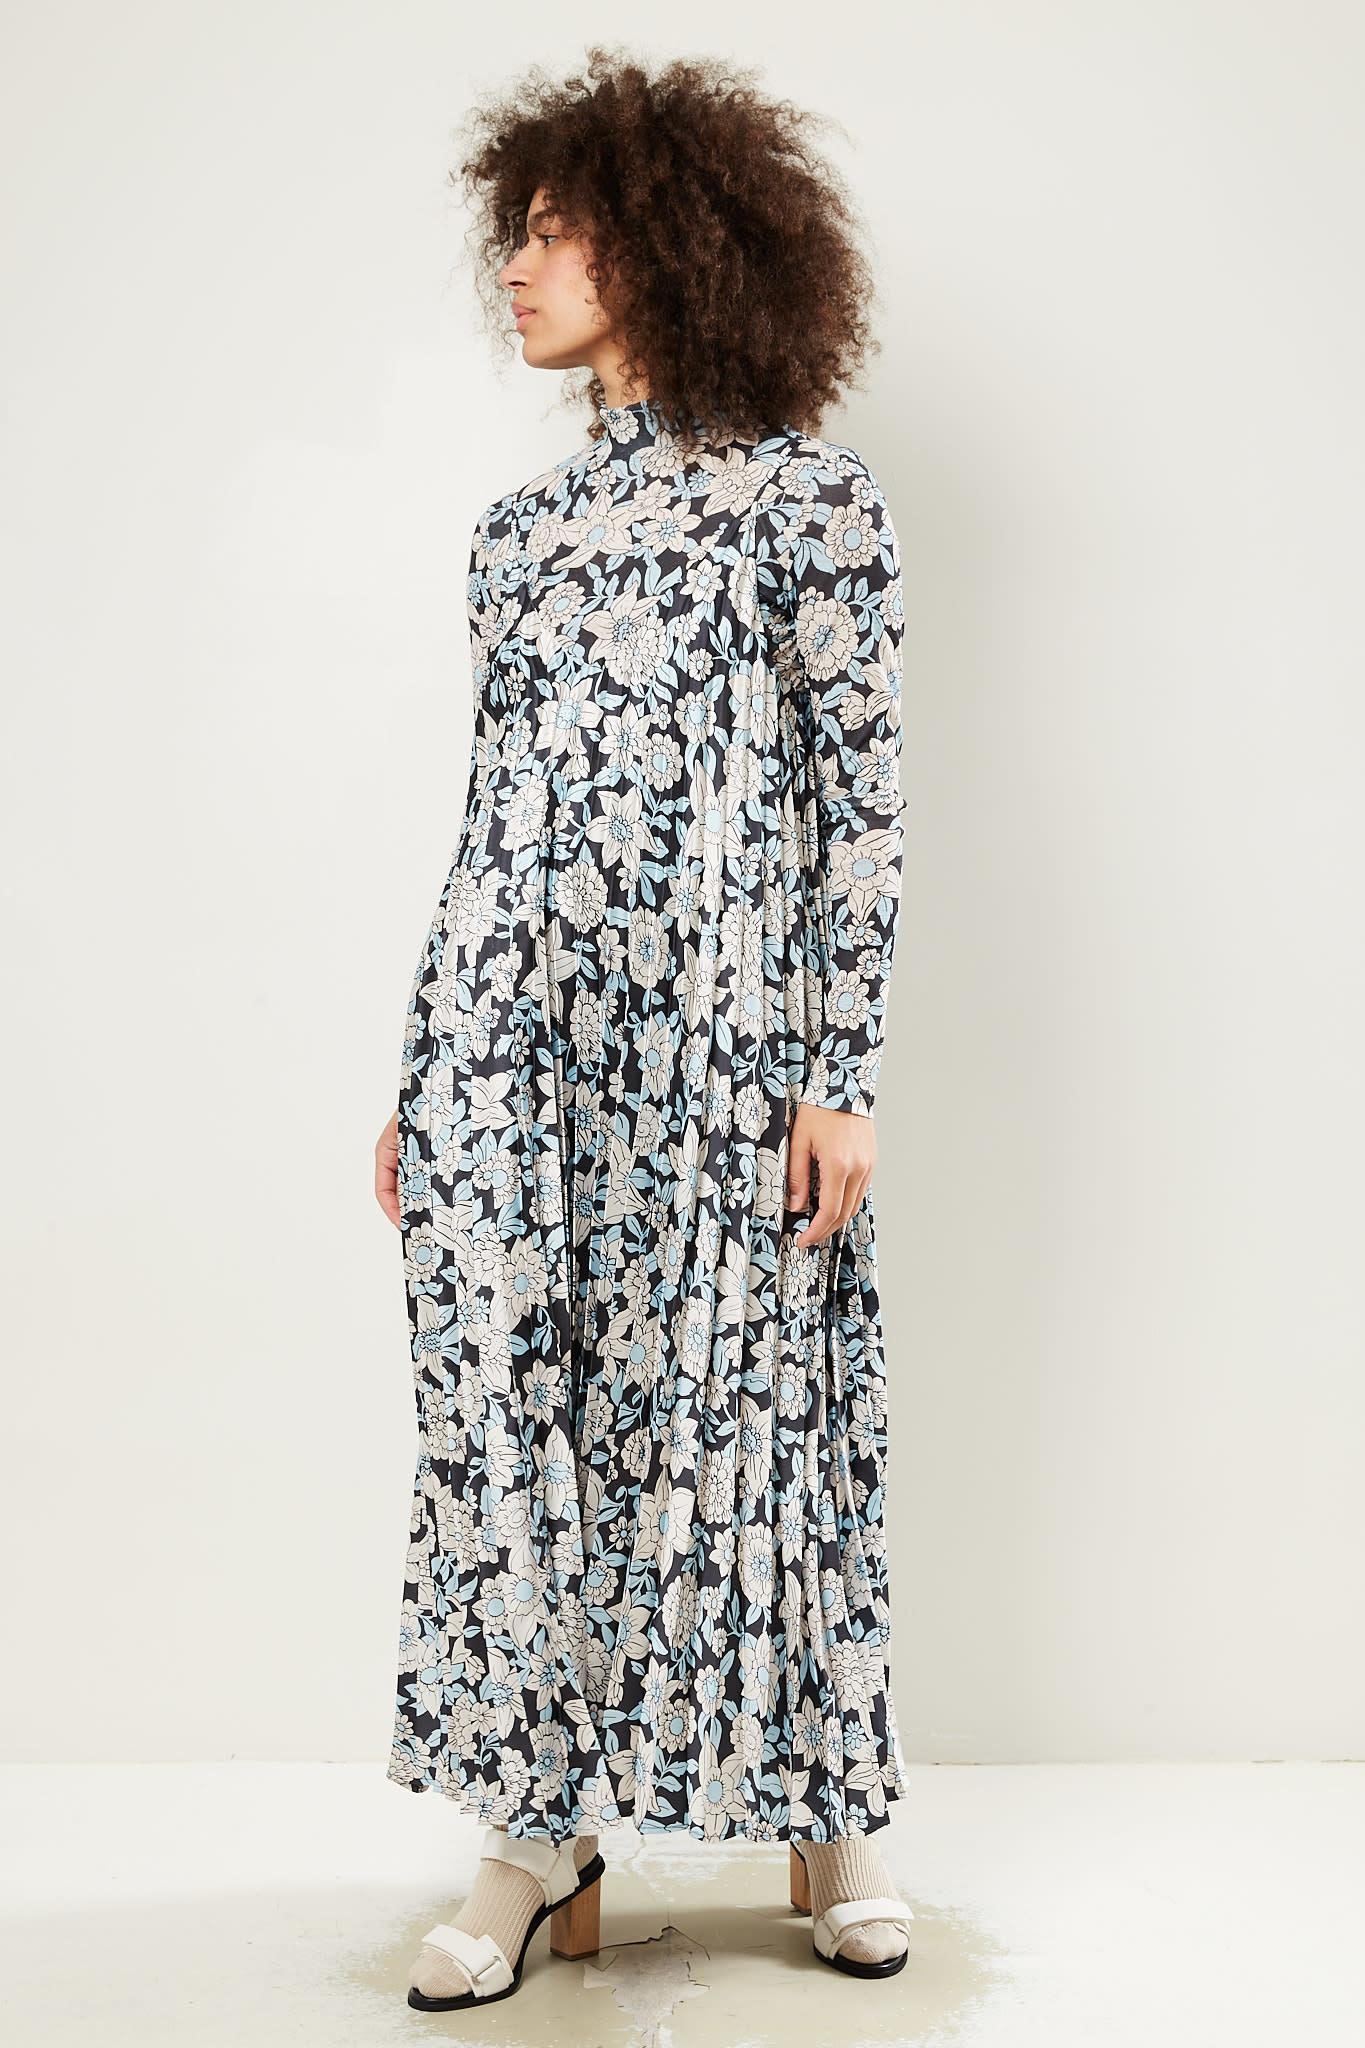 Christian Wijnants Davit plisse dress